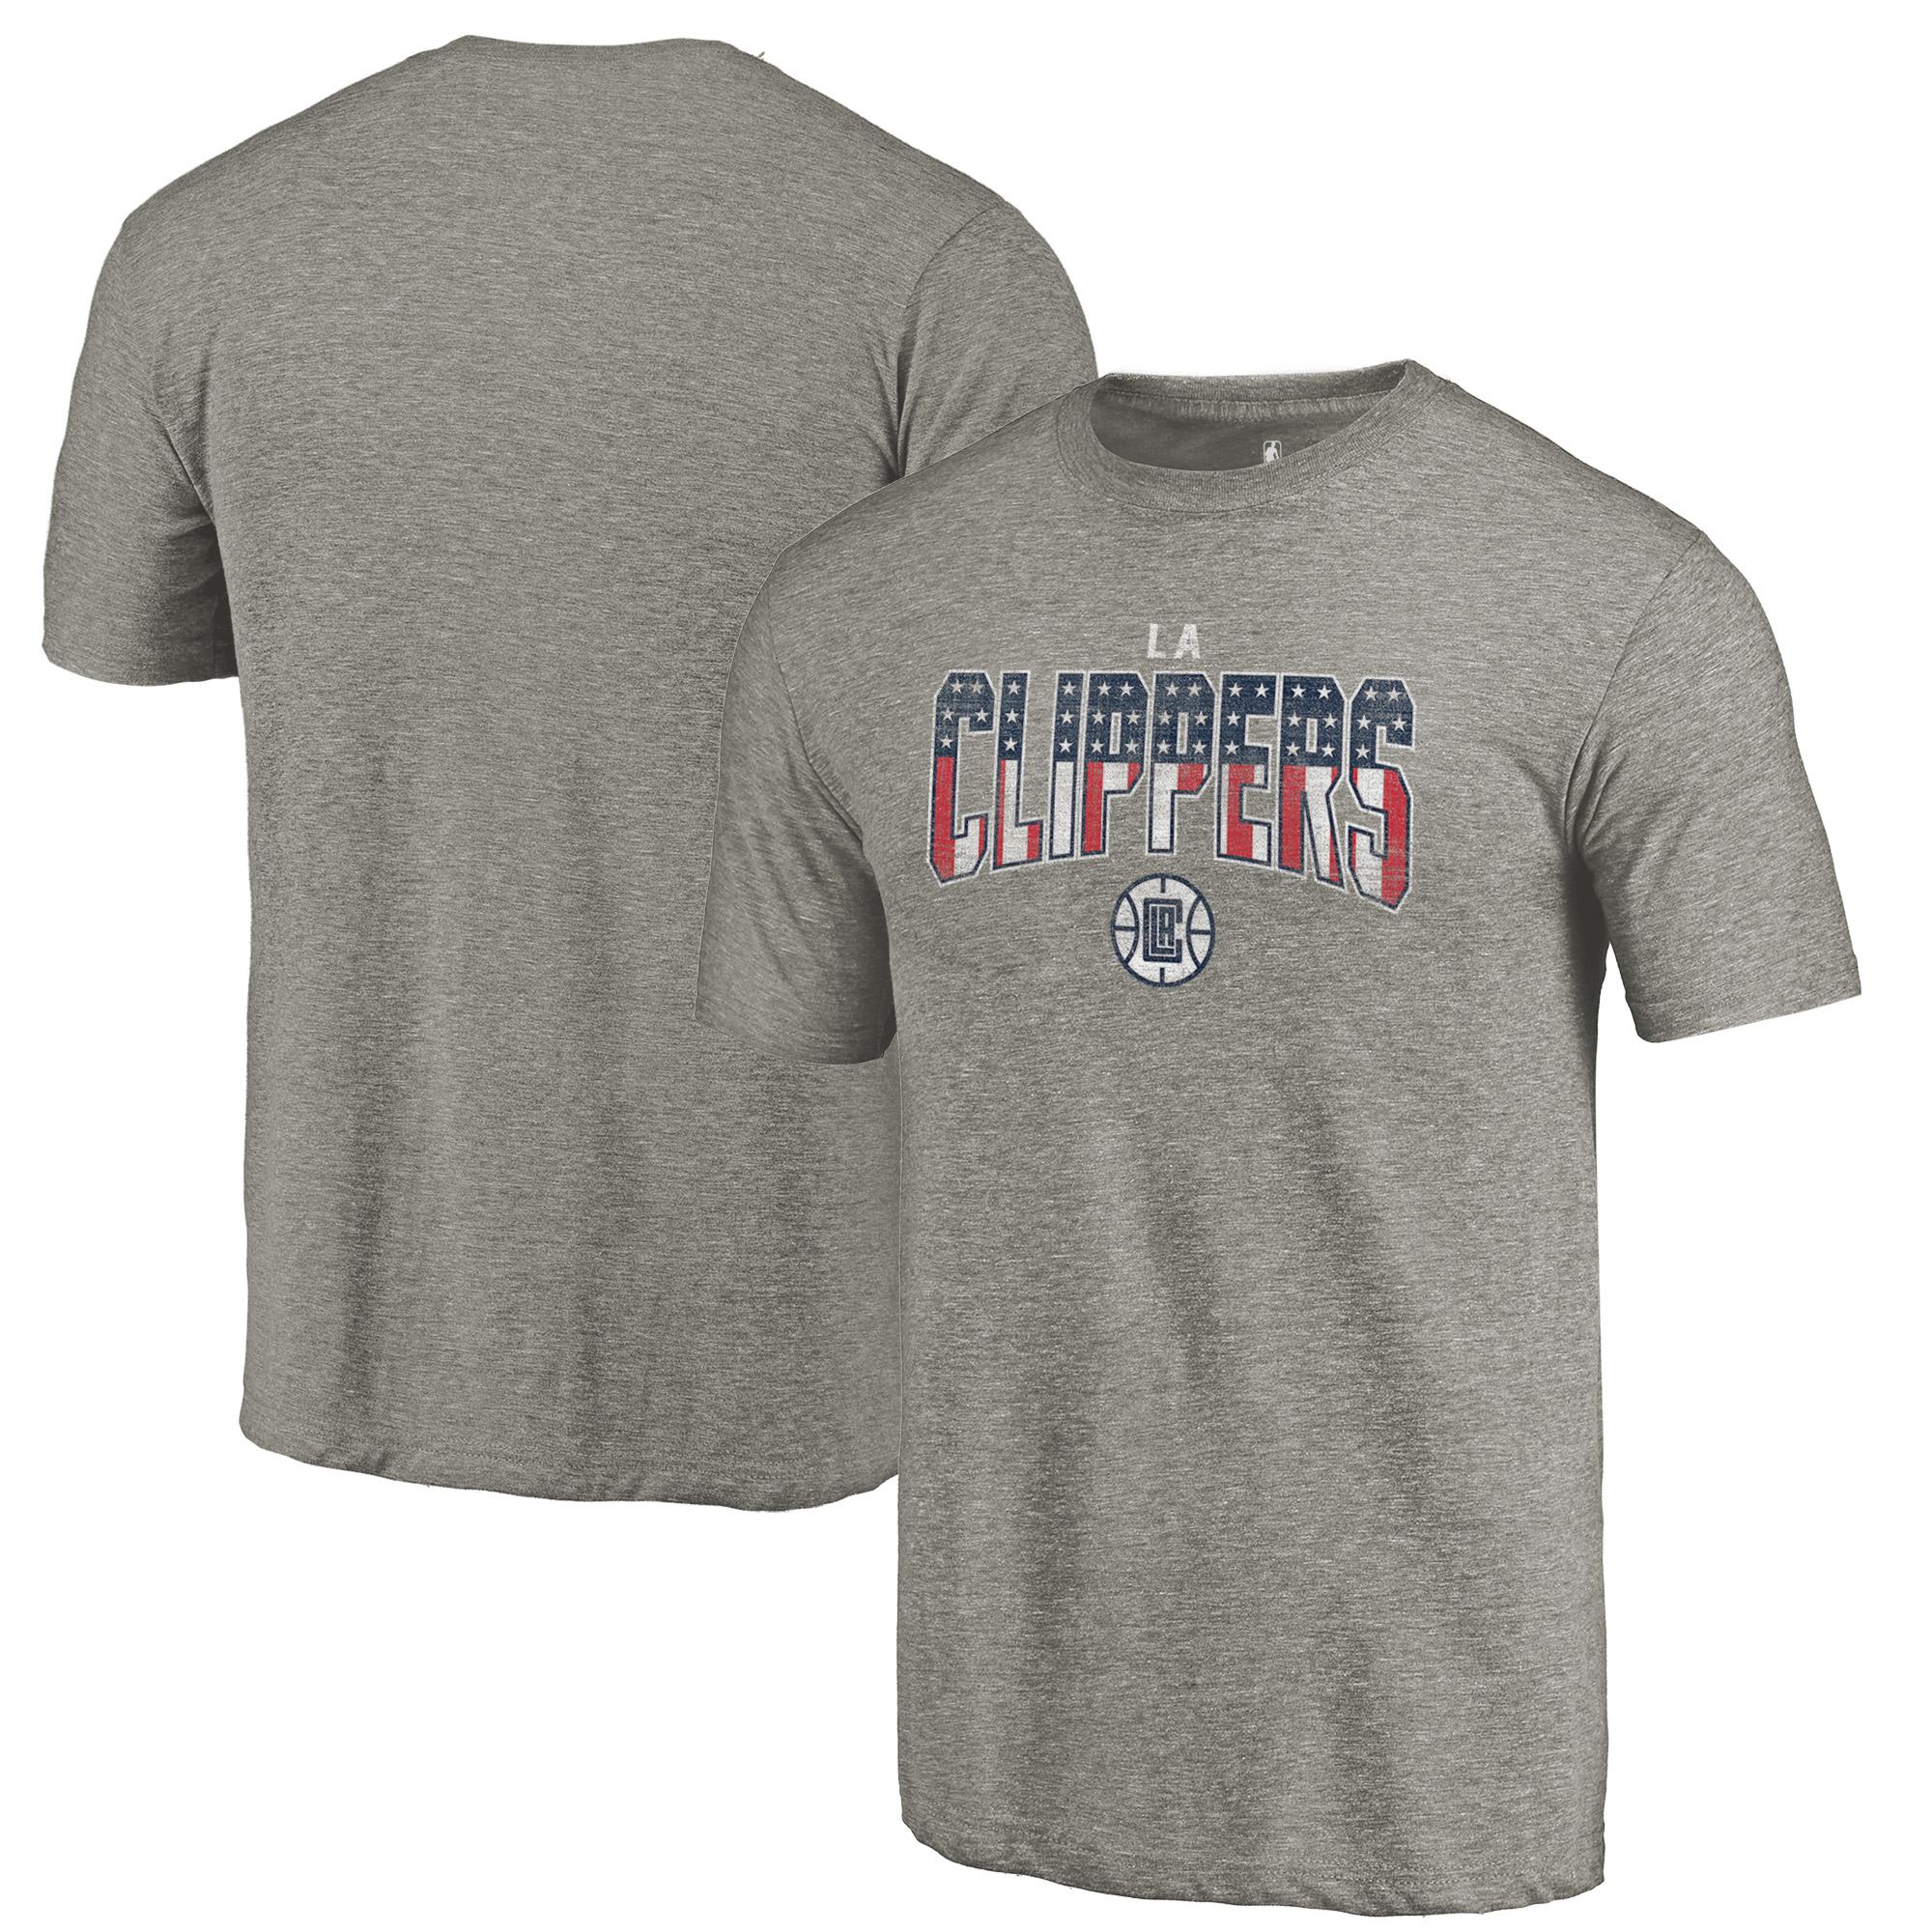 LA Clippers Fanatics Branded Freedom Tri-Blend T-Shirt - Gray